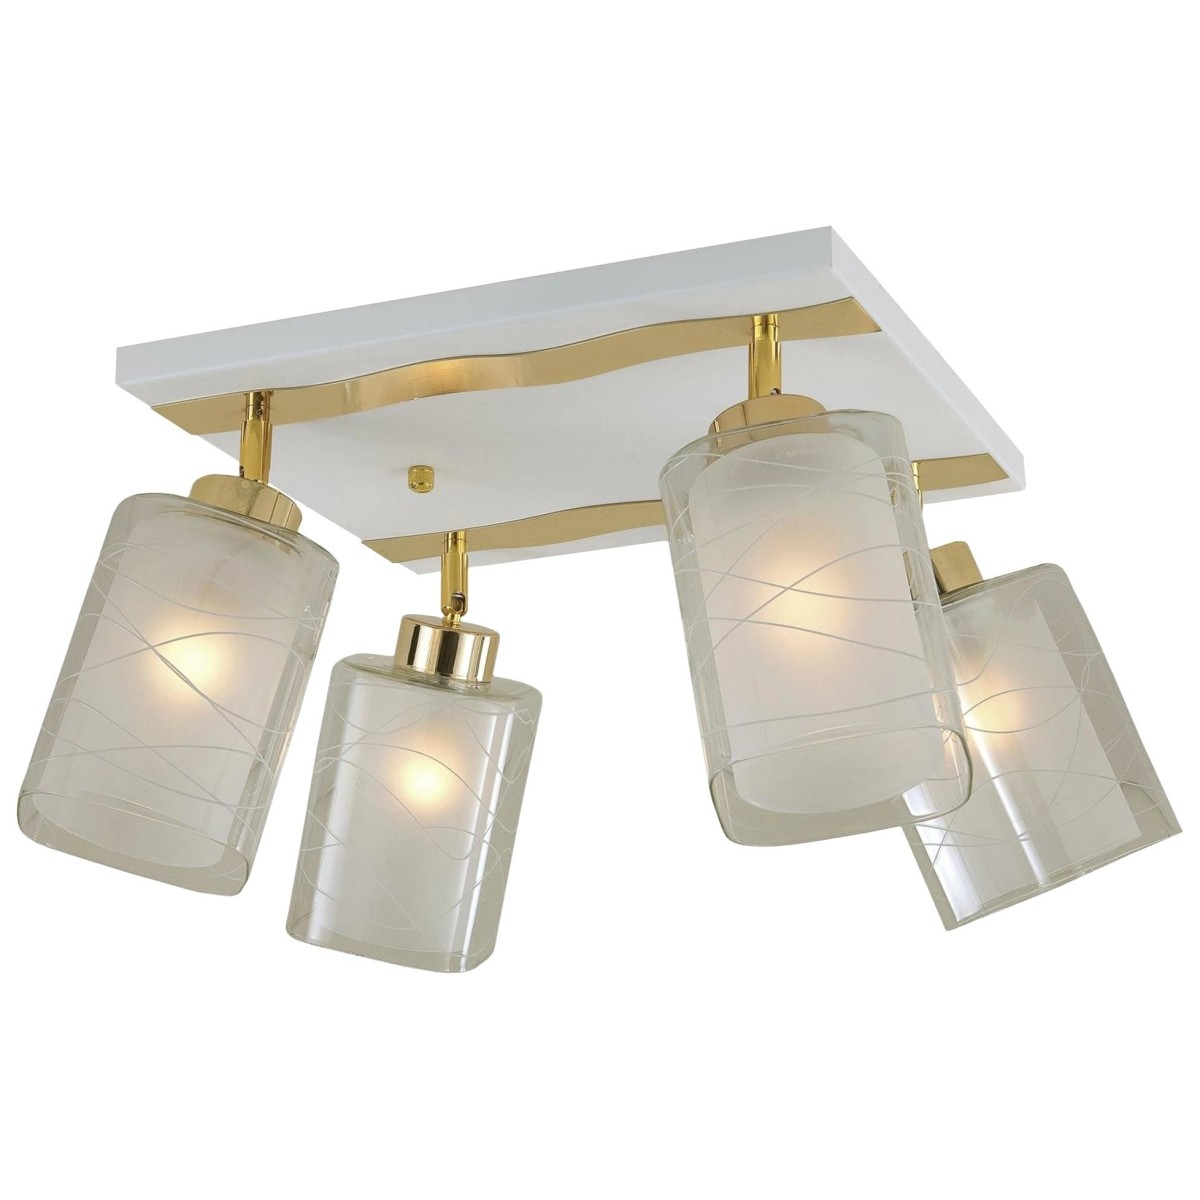 Люстра Citilux Прима Cl160142 E27 4 Лампы 14 М²